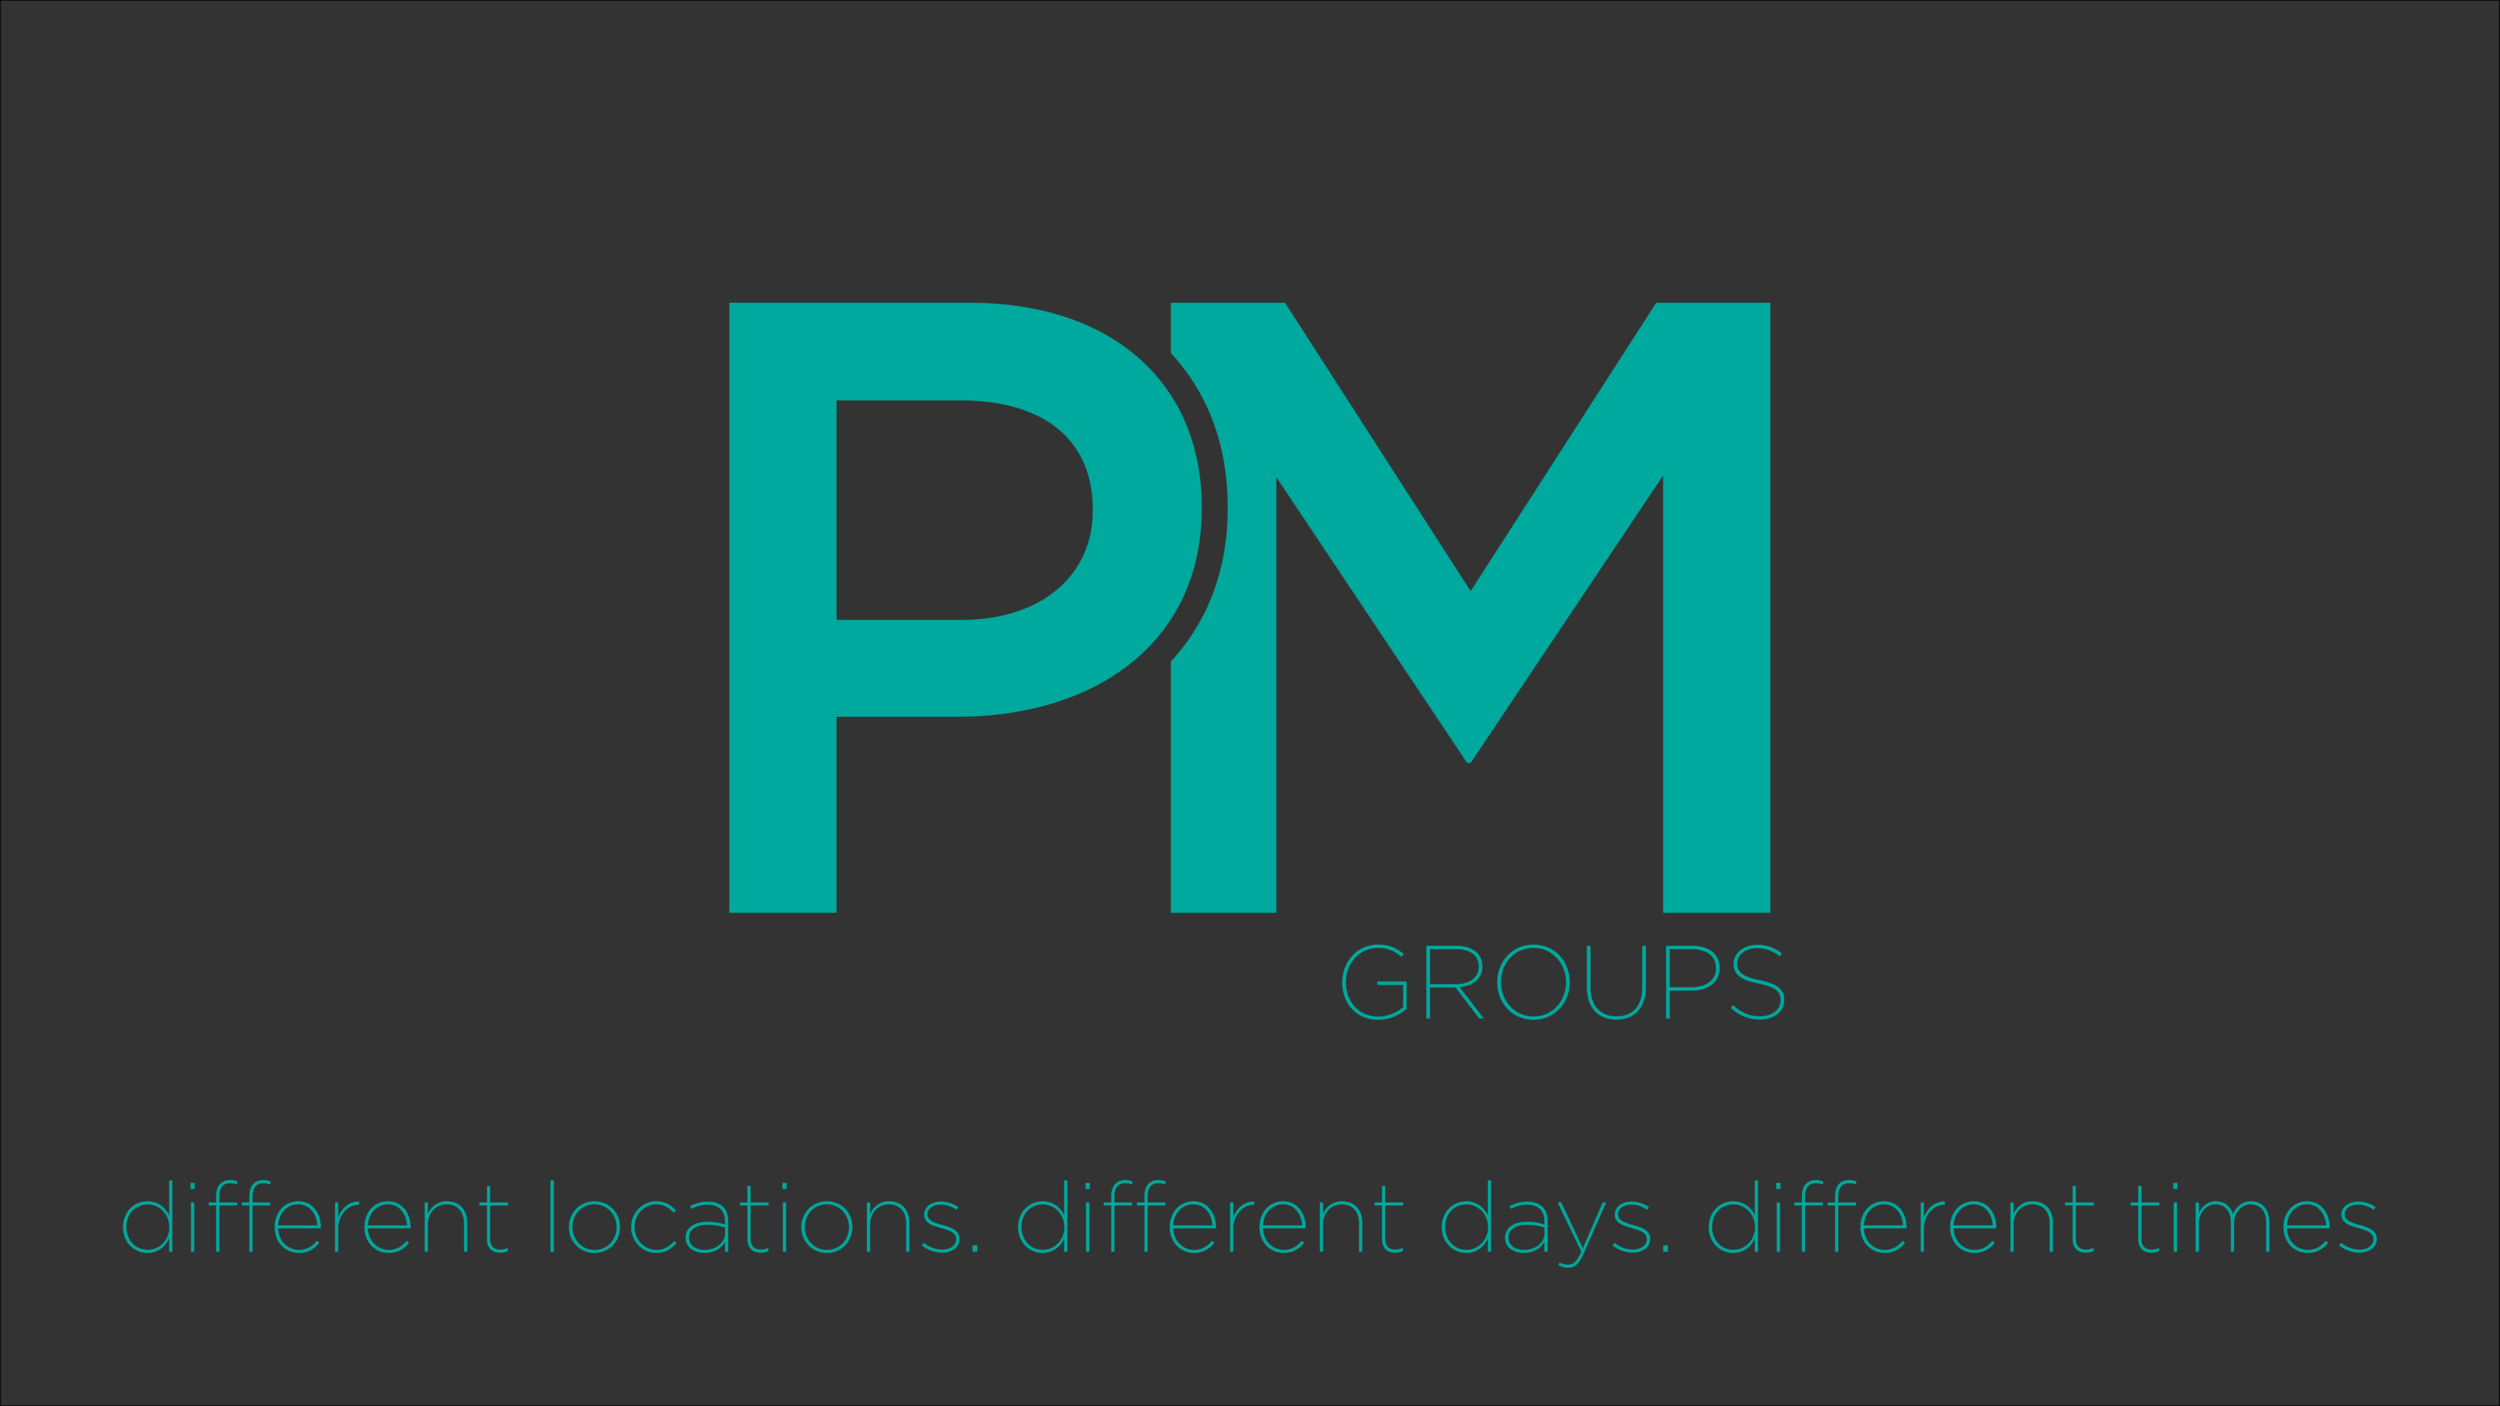 PM GROUPS SLIDE-03.png